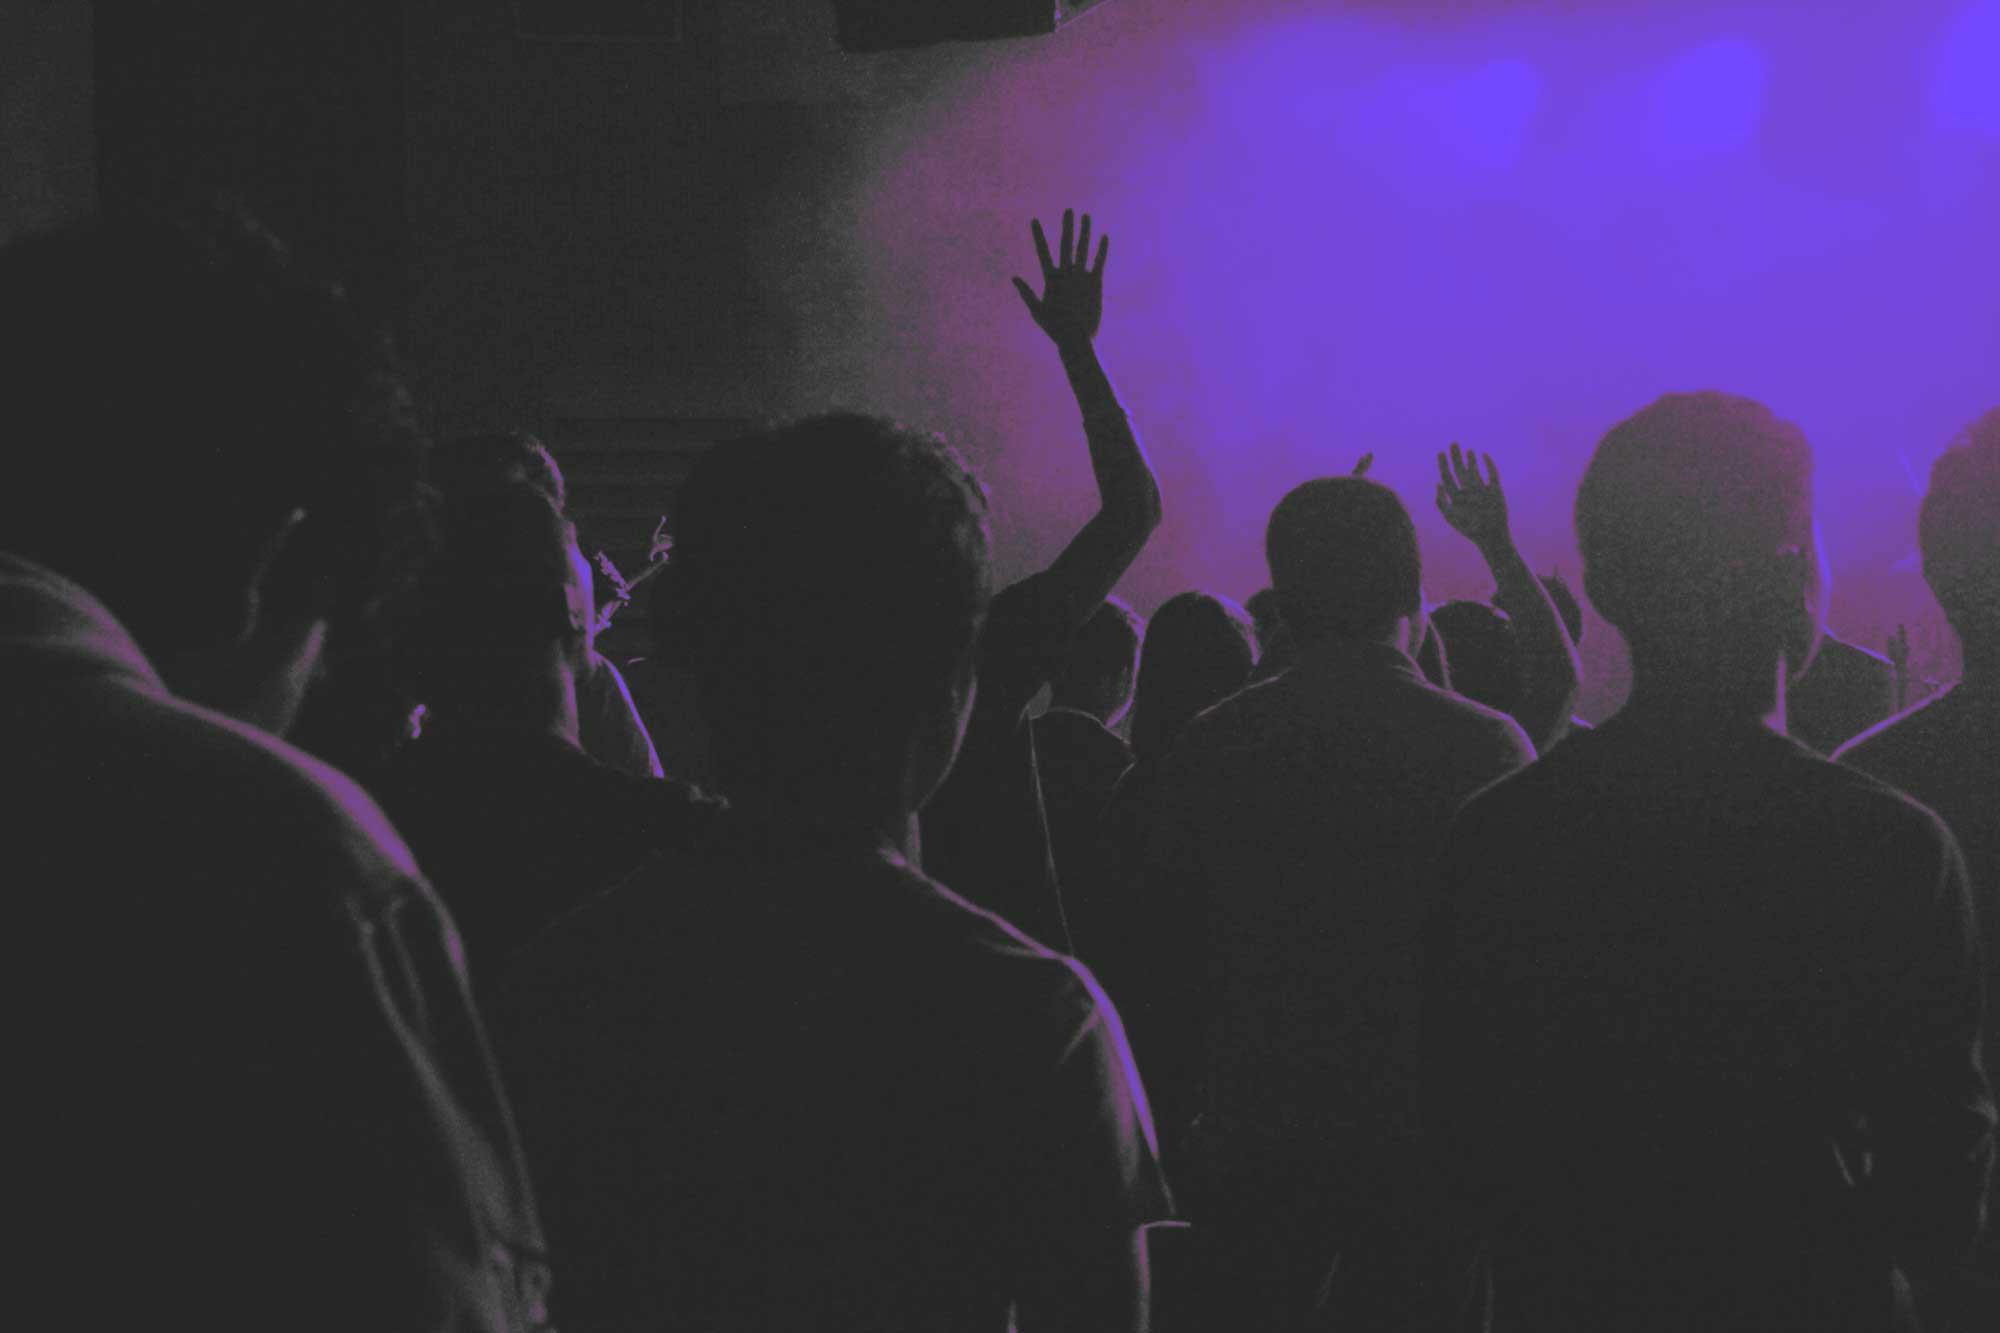 People dancing in a venue